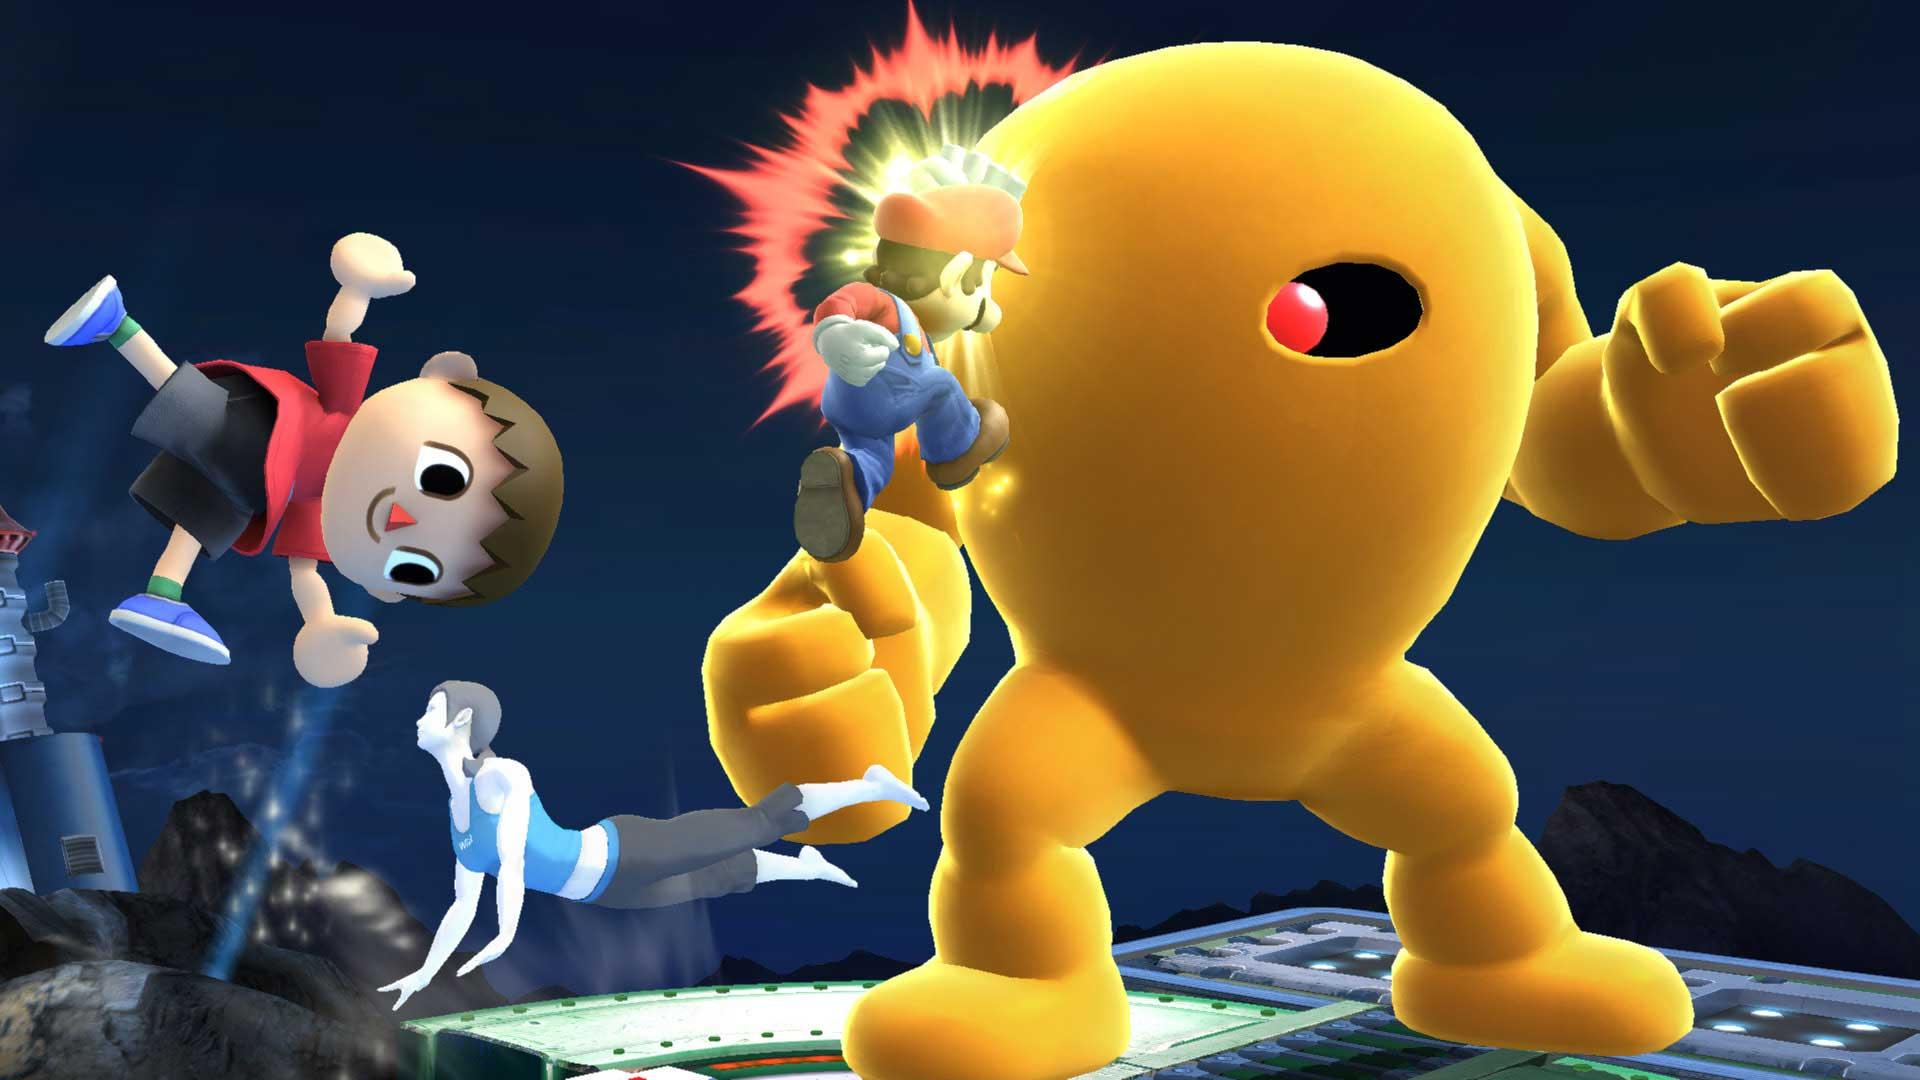 Super Smash Bros. features revealed at Nintendo Direct